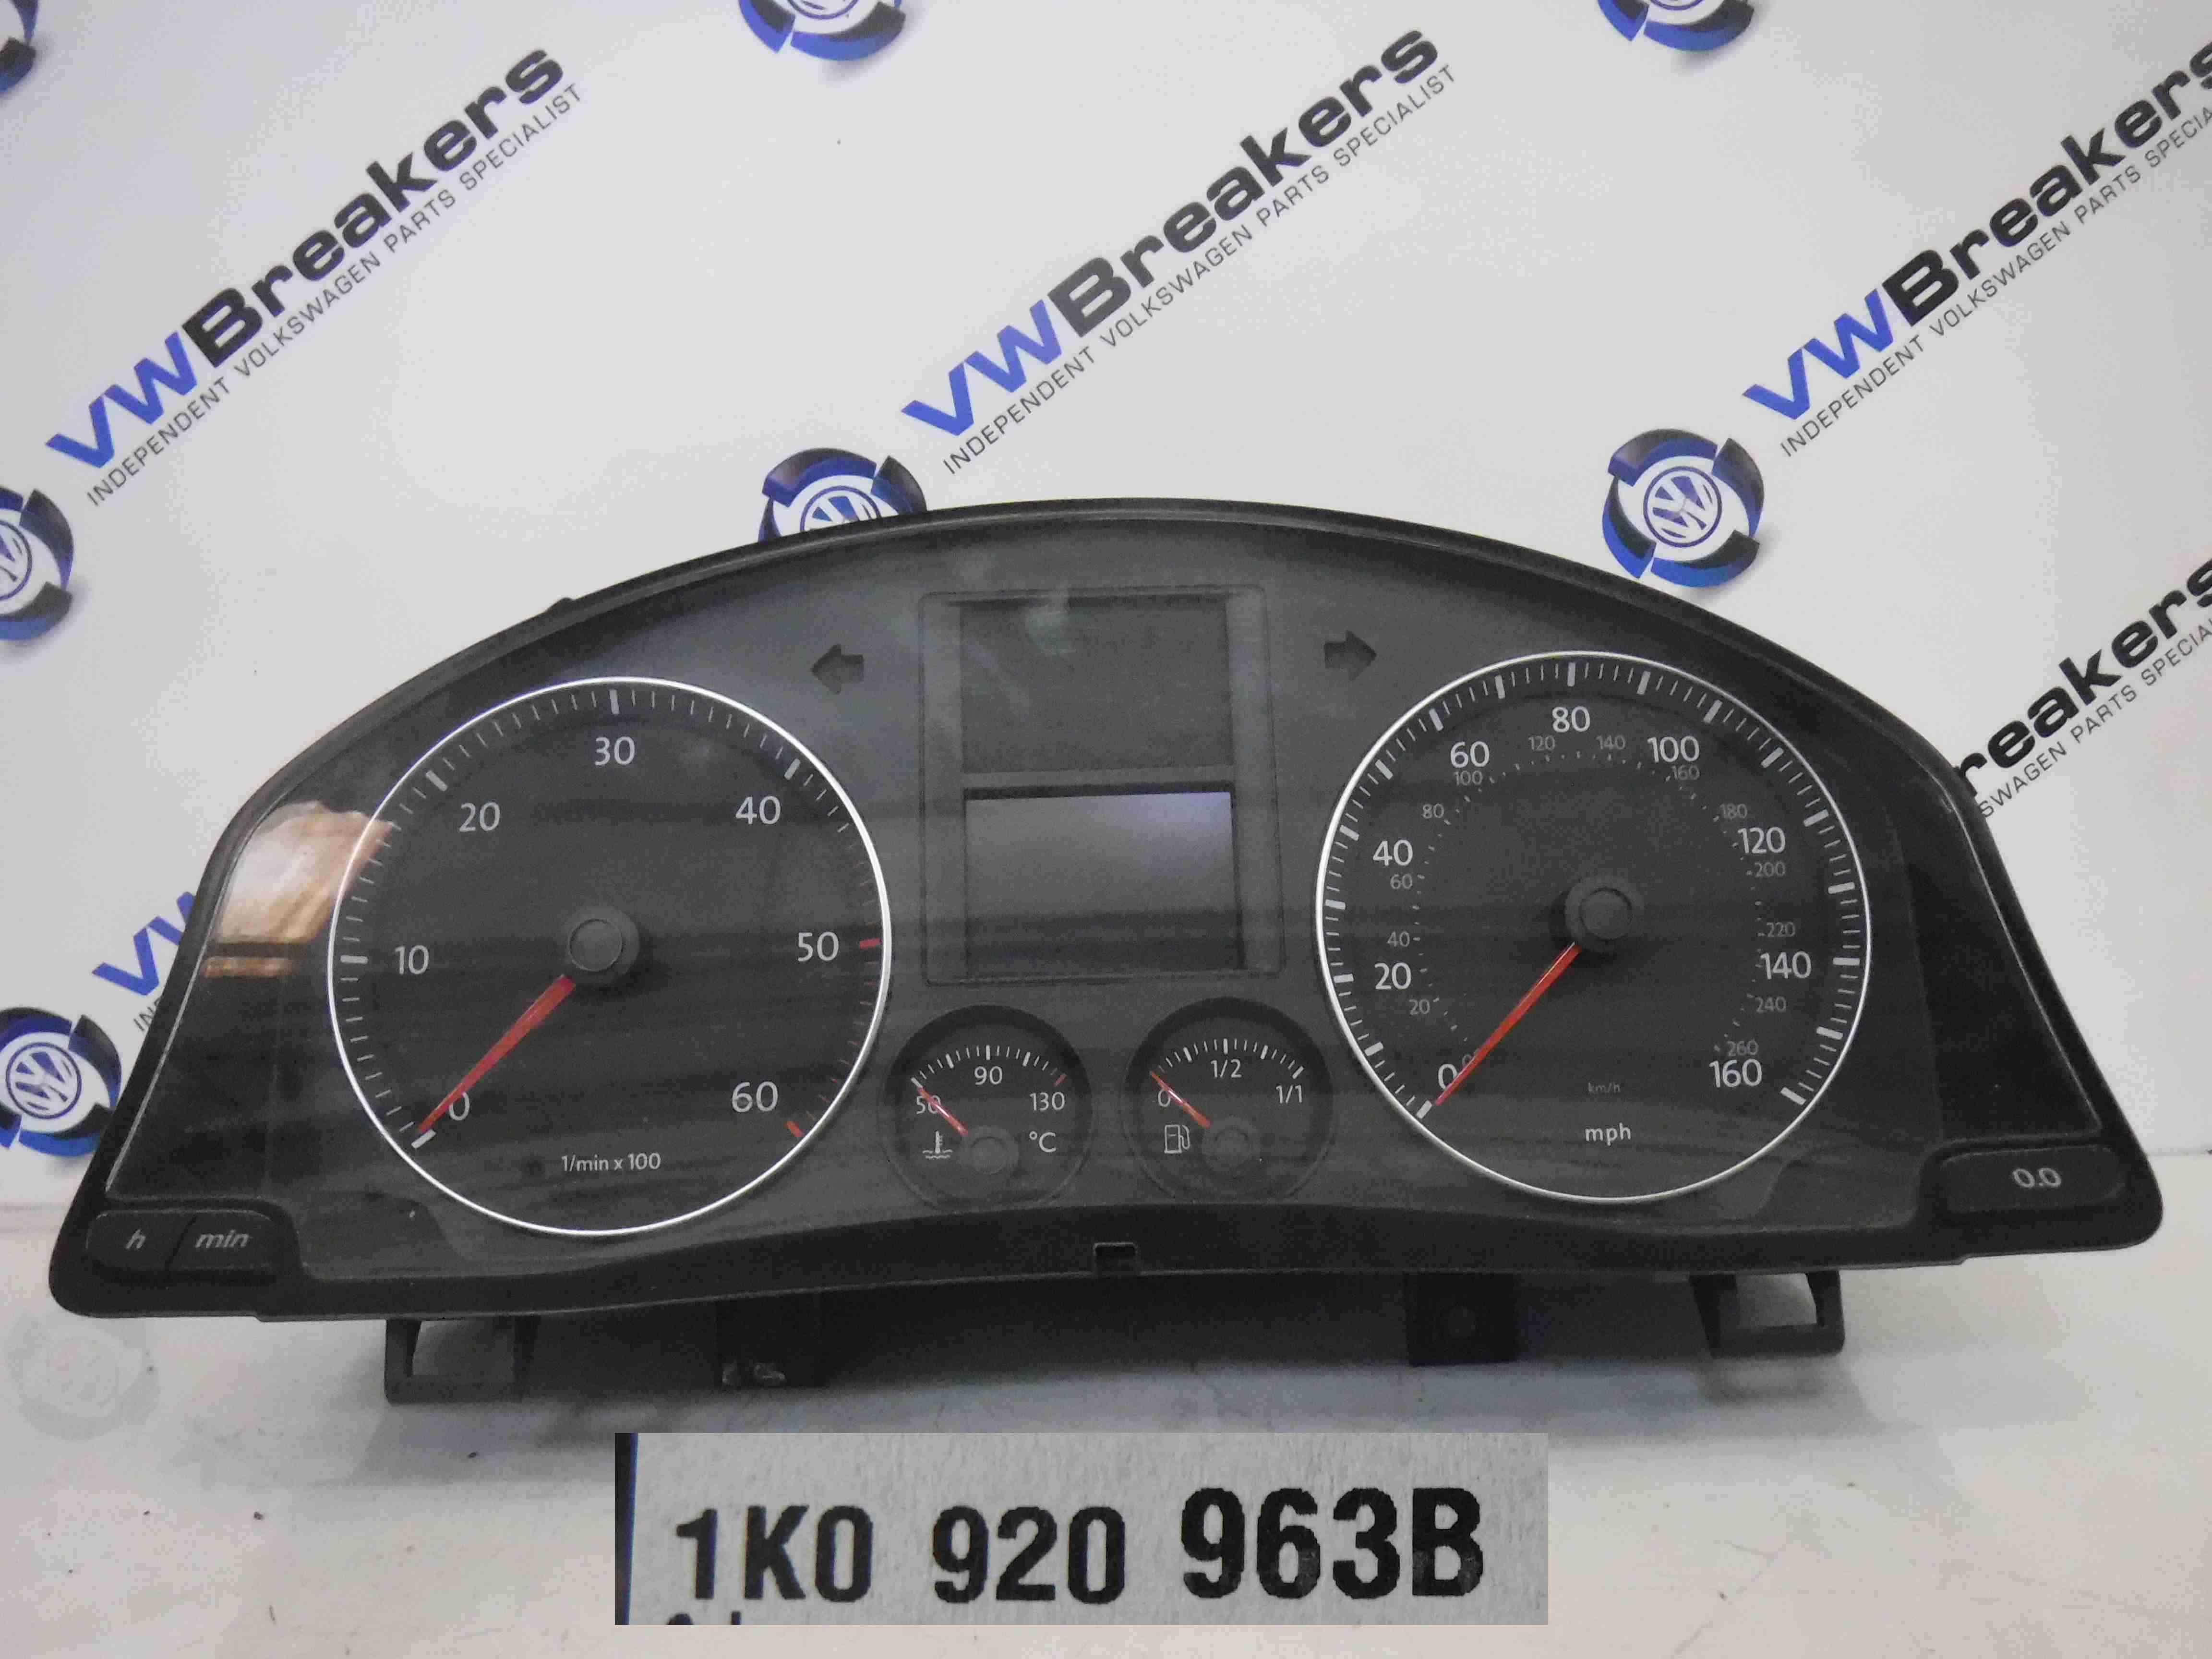 Volkswagen Jetta A5 Golf Mk5 2005-2011 Instrument Panel Dials Gauges Clocks 98K